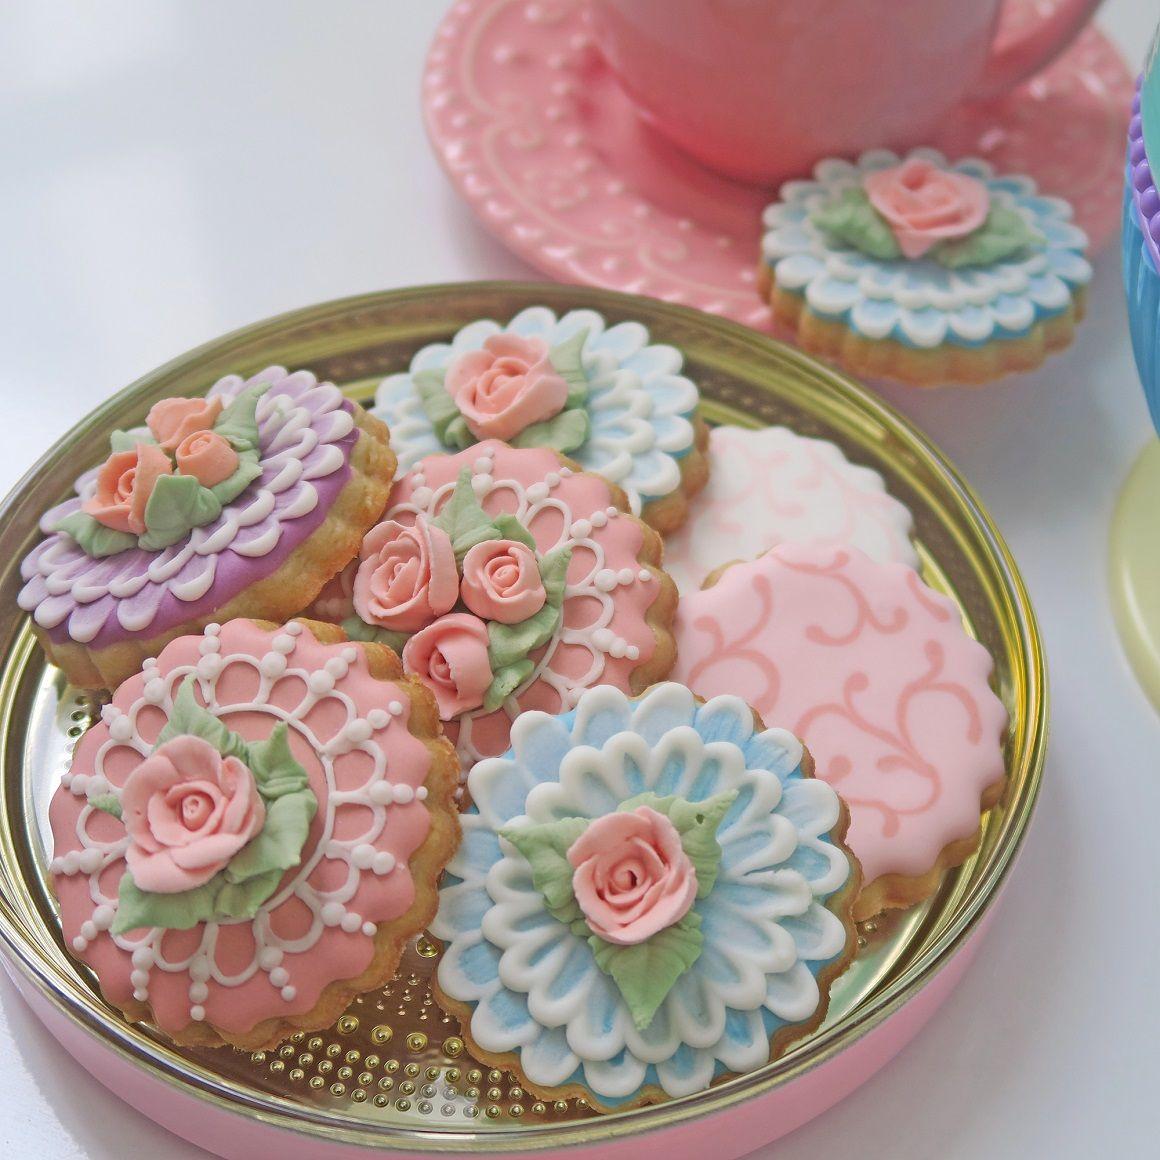 biscoitos_decorado